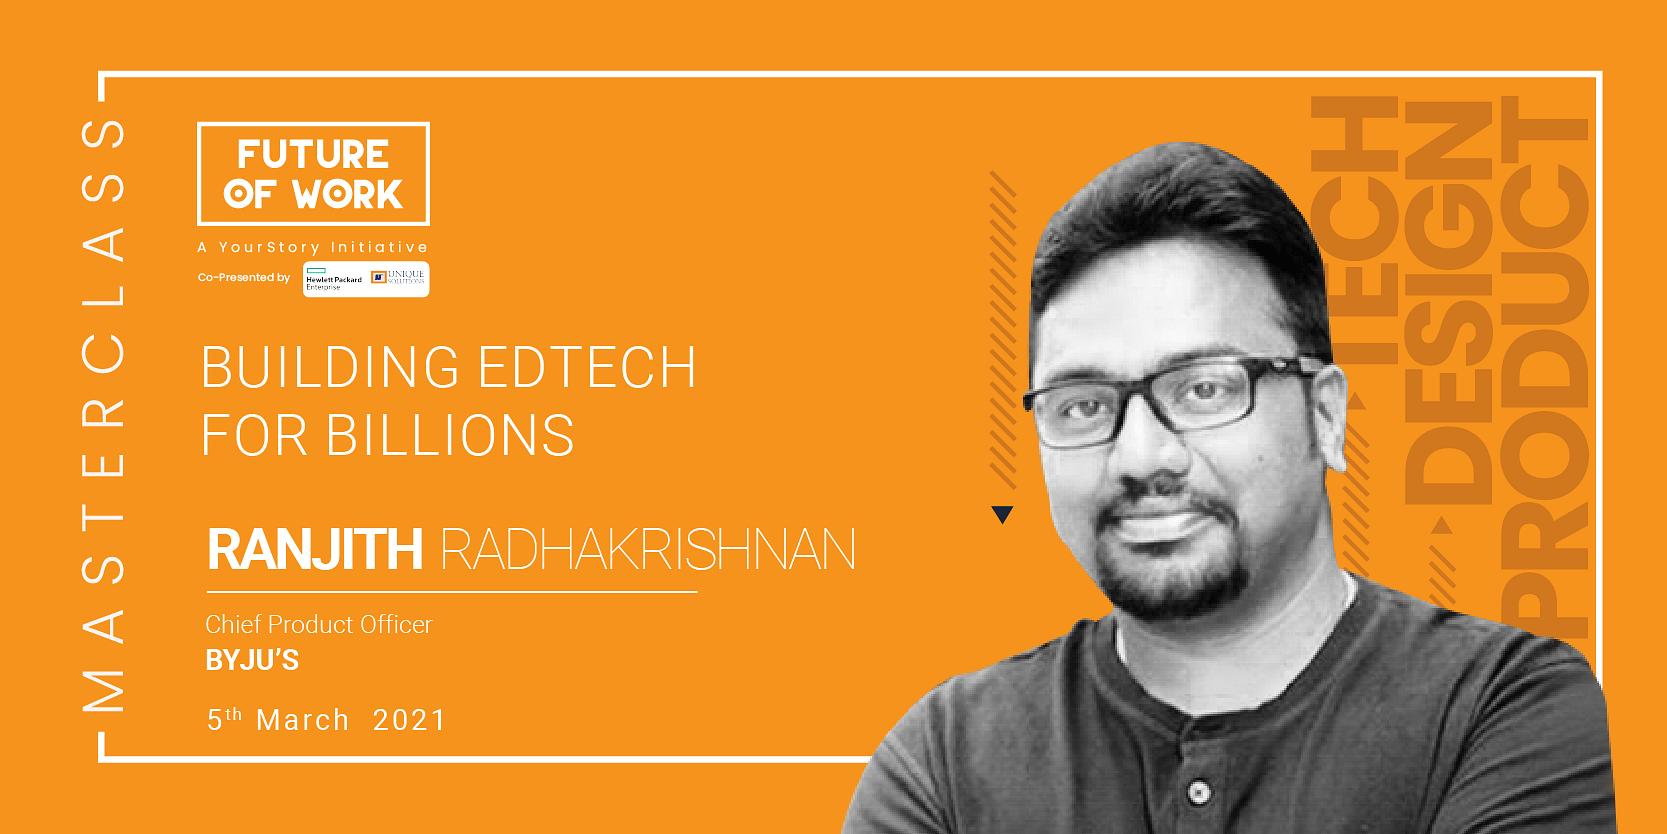 BYJU'S CPO Ranjith Radhakrishnan outlines key areas of building an edtech playbook